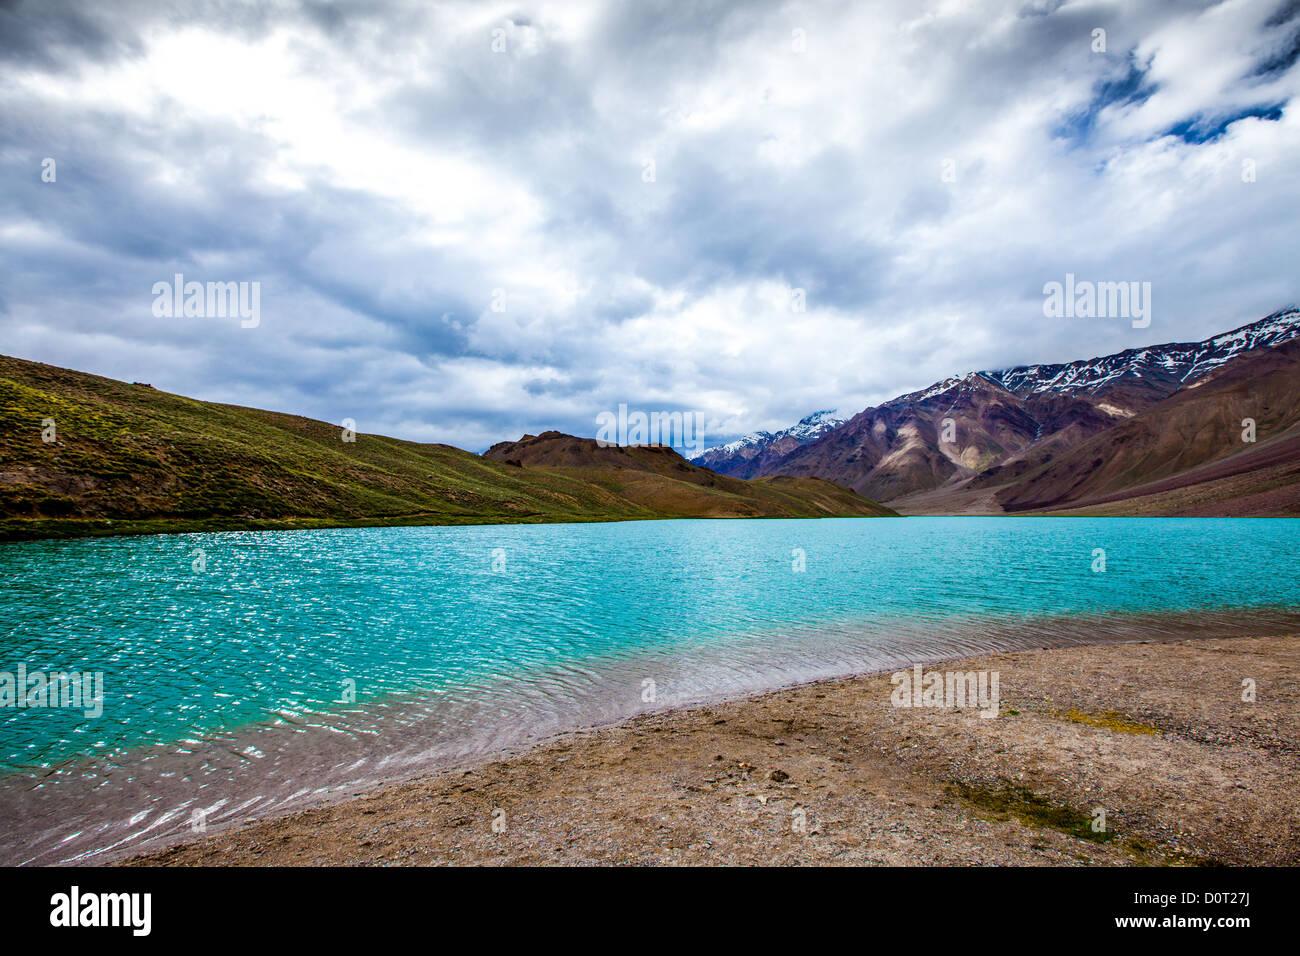 lake Chandra Taal, Spiti Valley - Stock Image